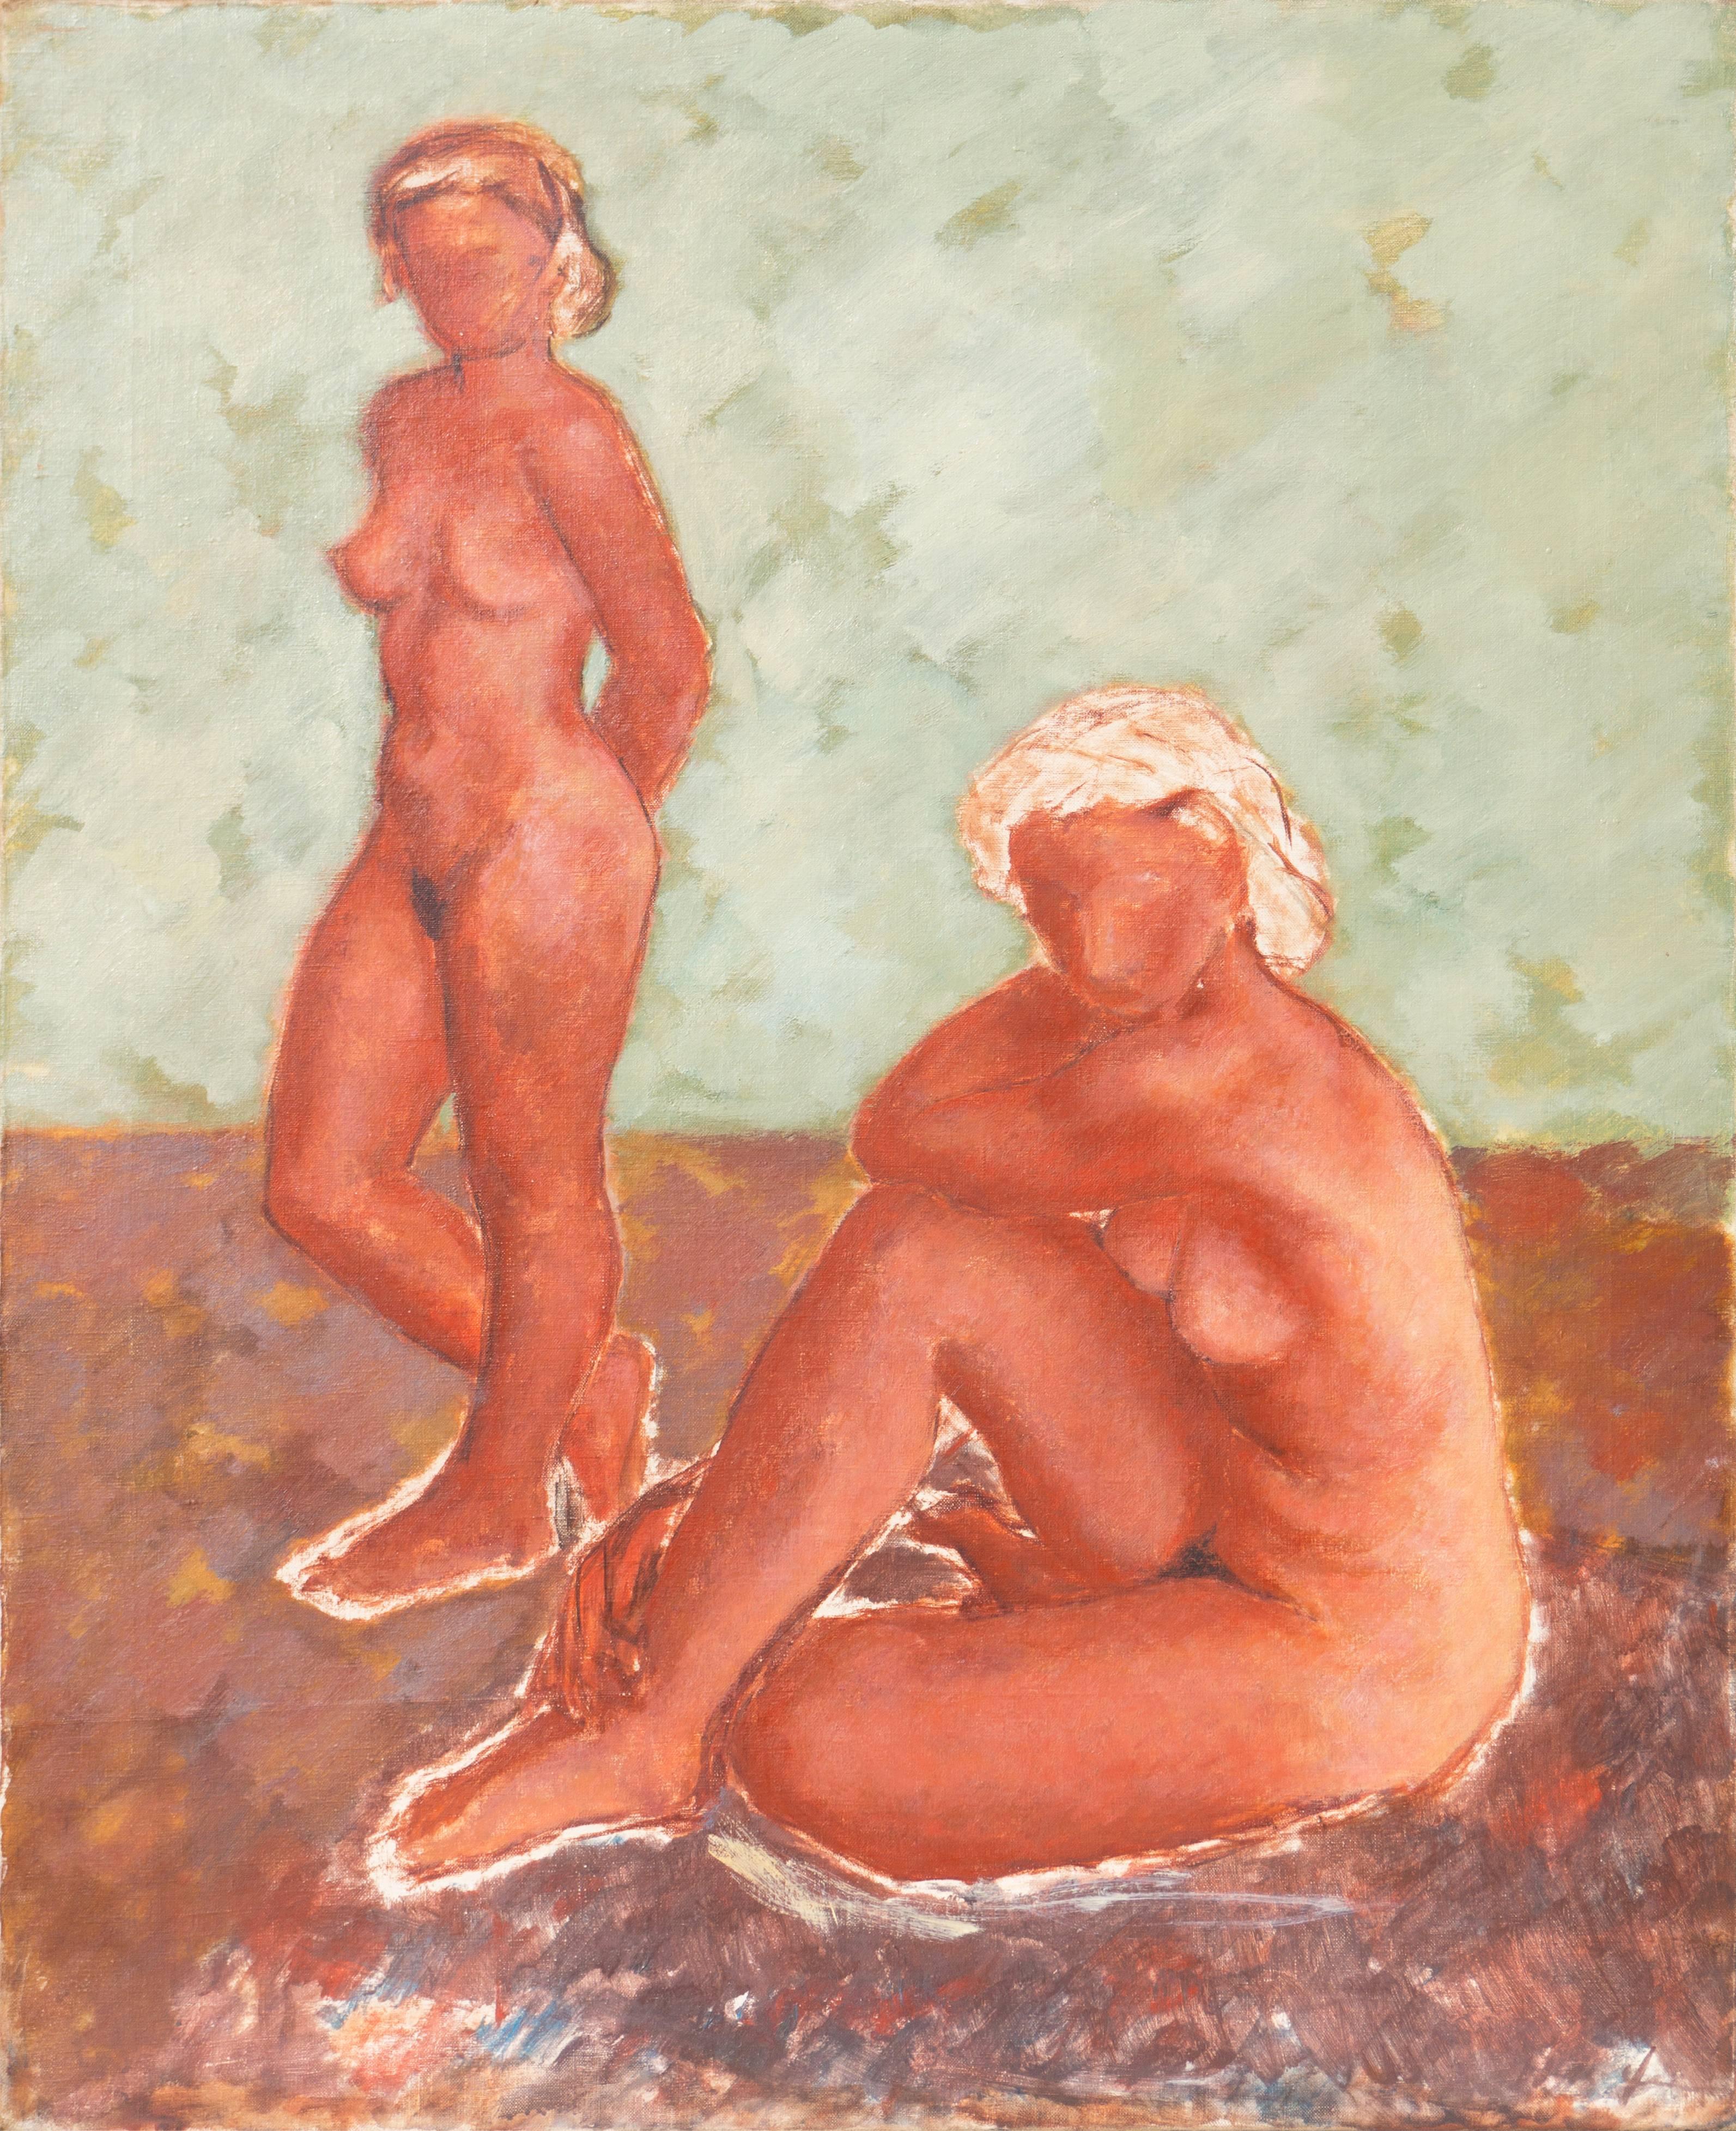 'Women in Ochre and Jade', Paris, Post Impressionist, Danish National Museum